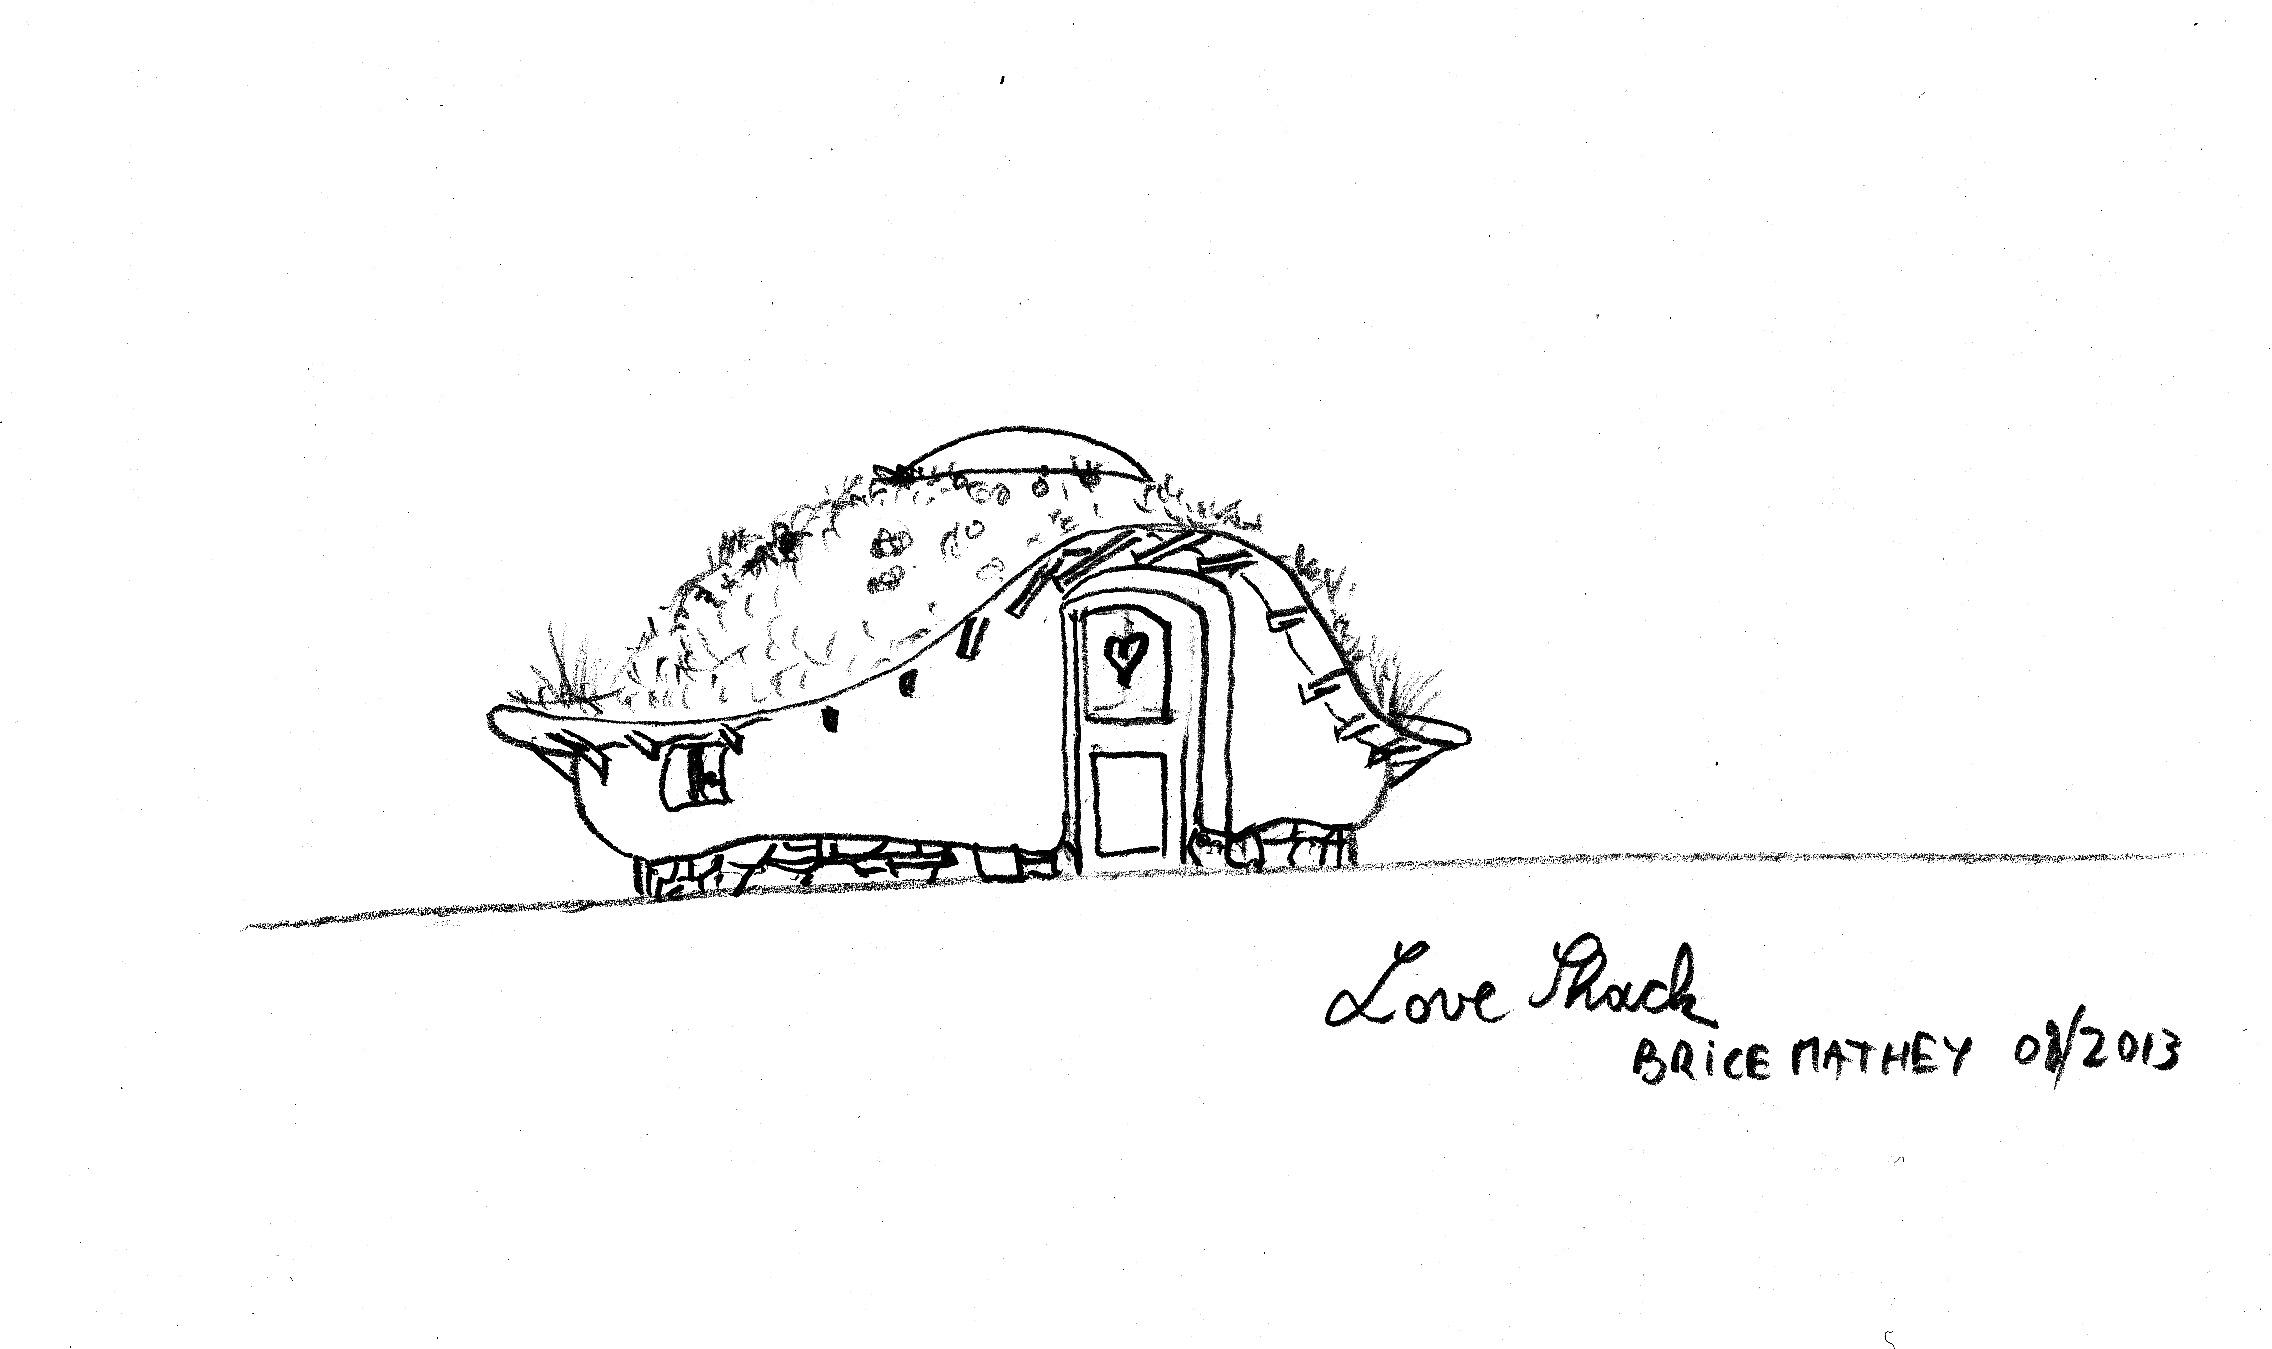 love shack sketch3